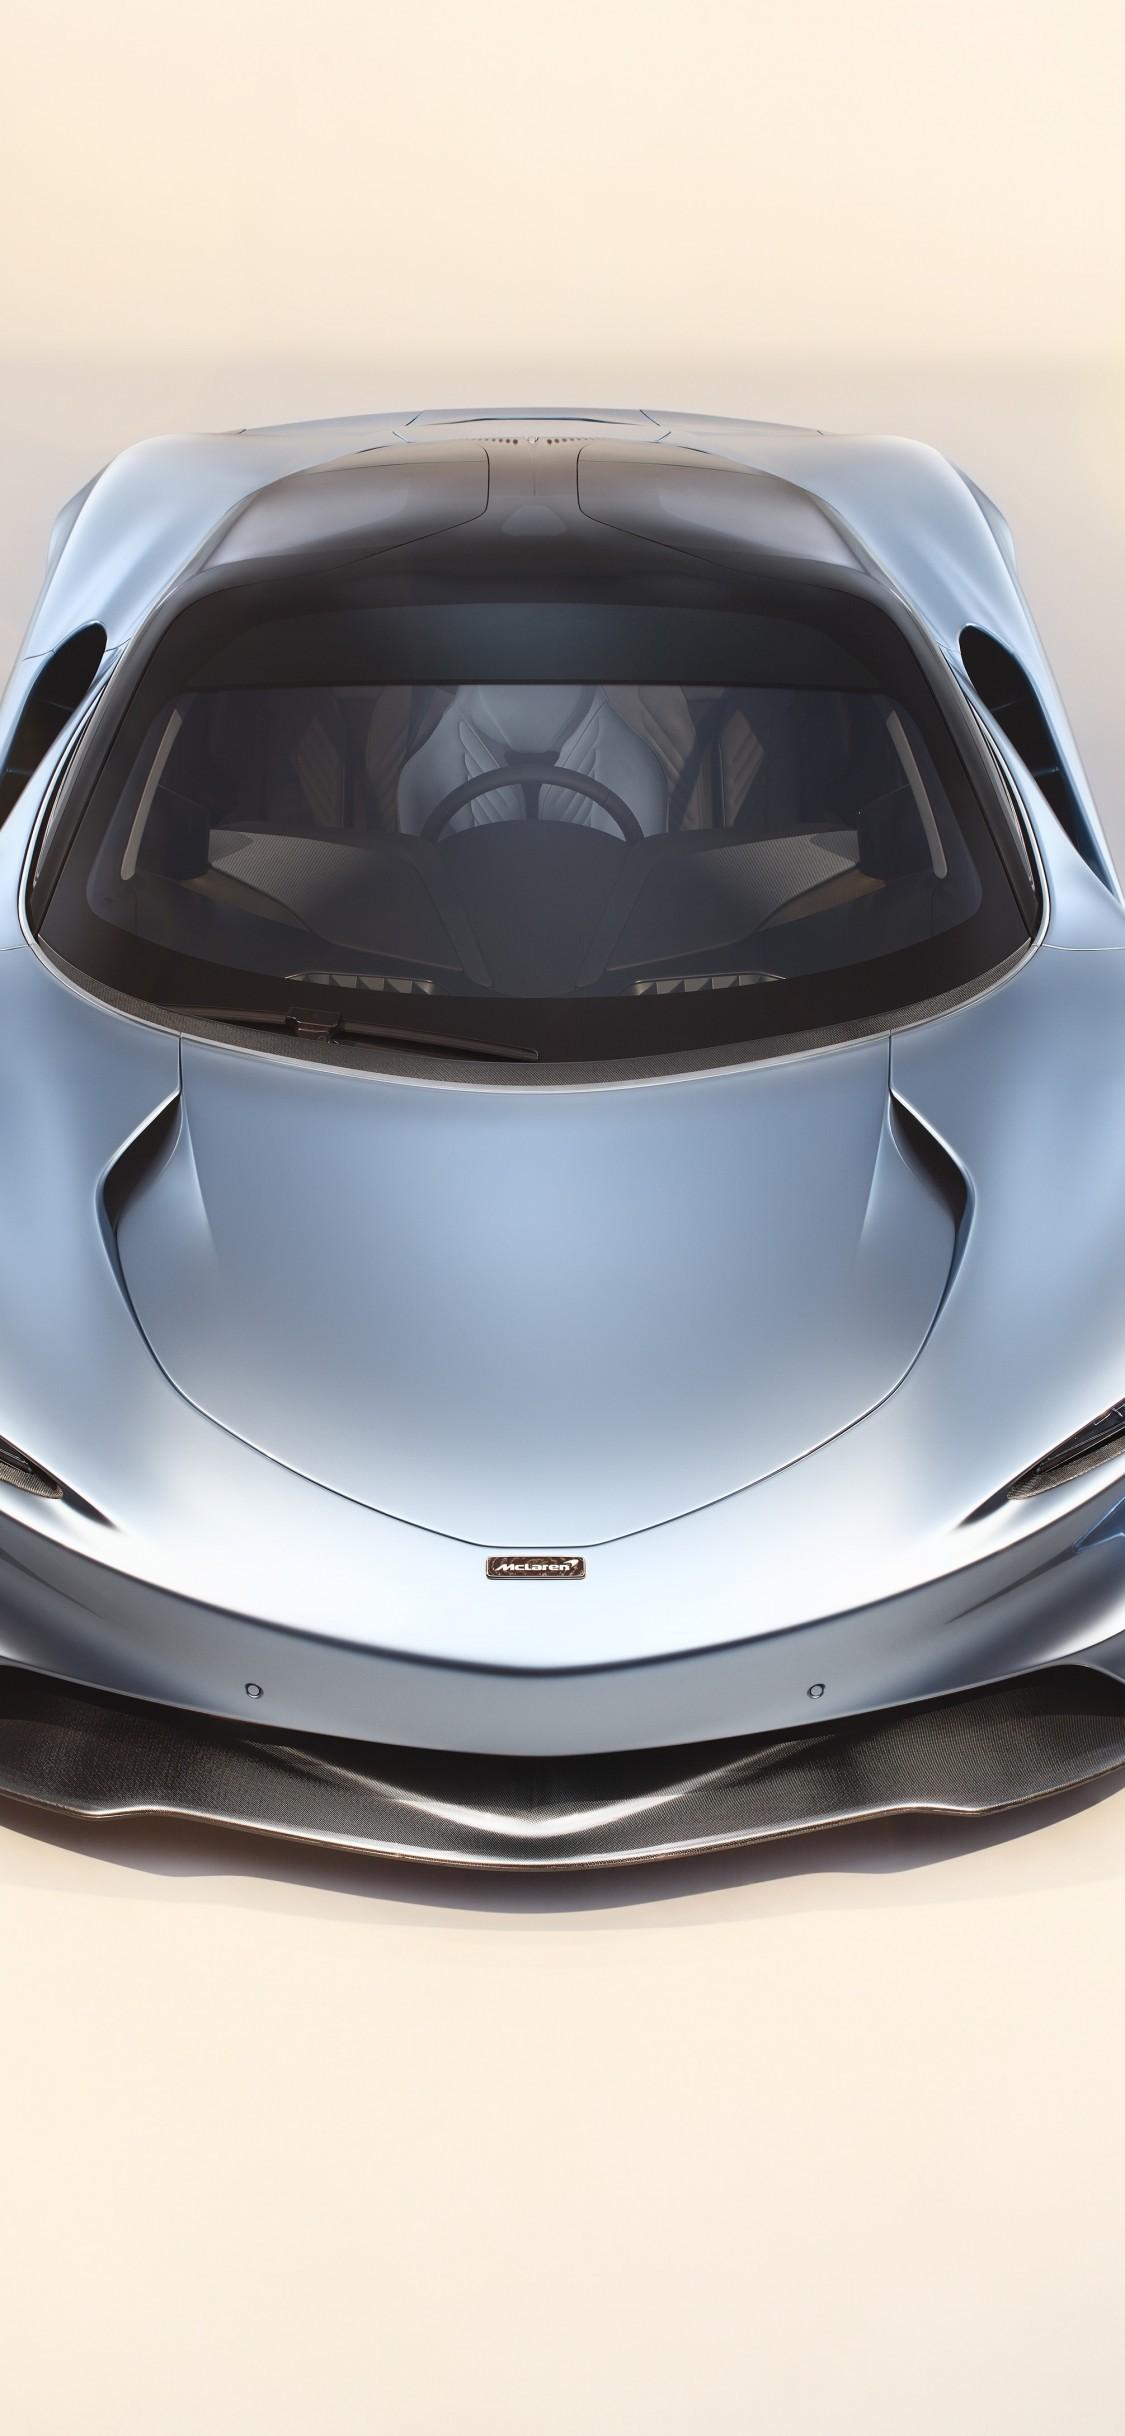 Download 1125x2436 Mclaren Speedtail Concept Design Hyper Cars 1125x2436